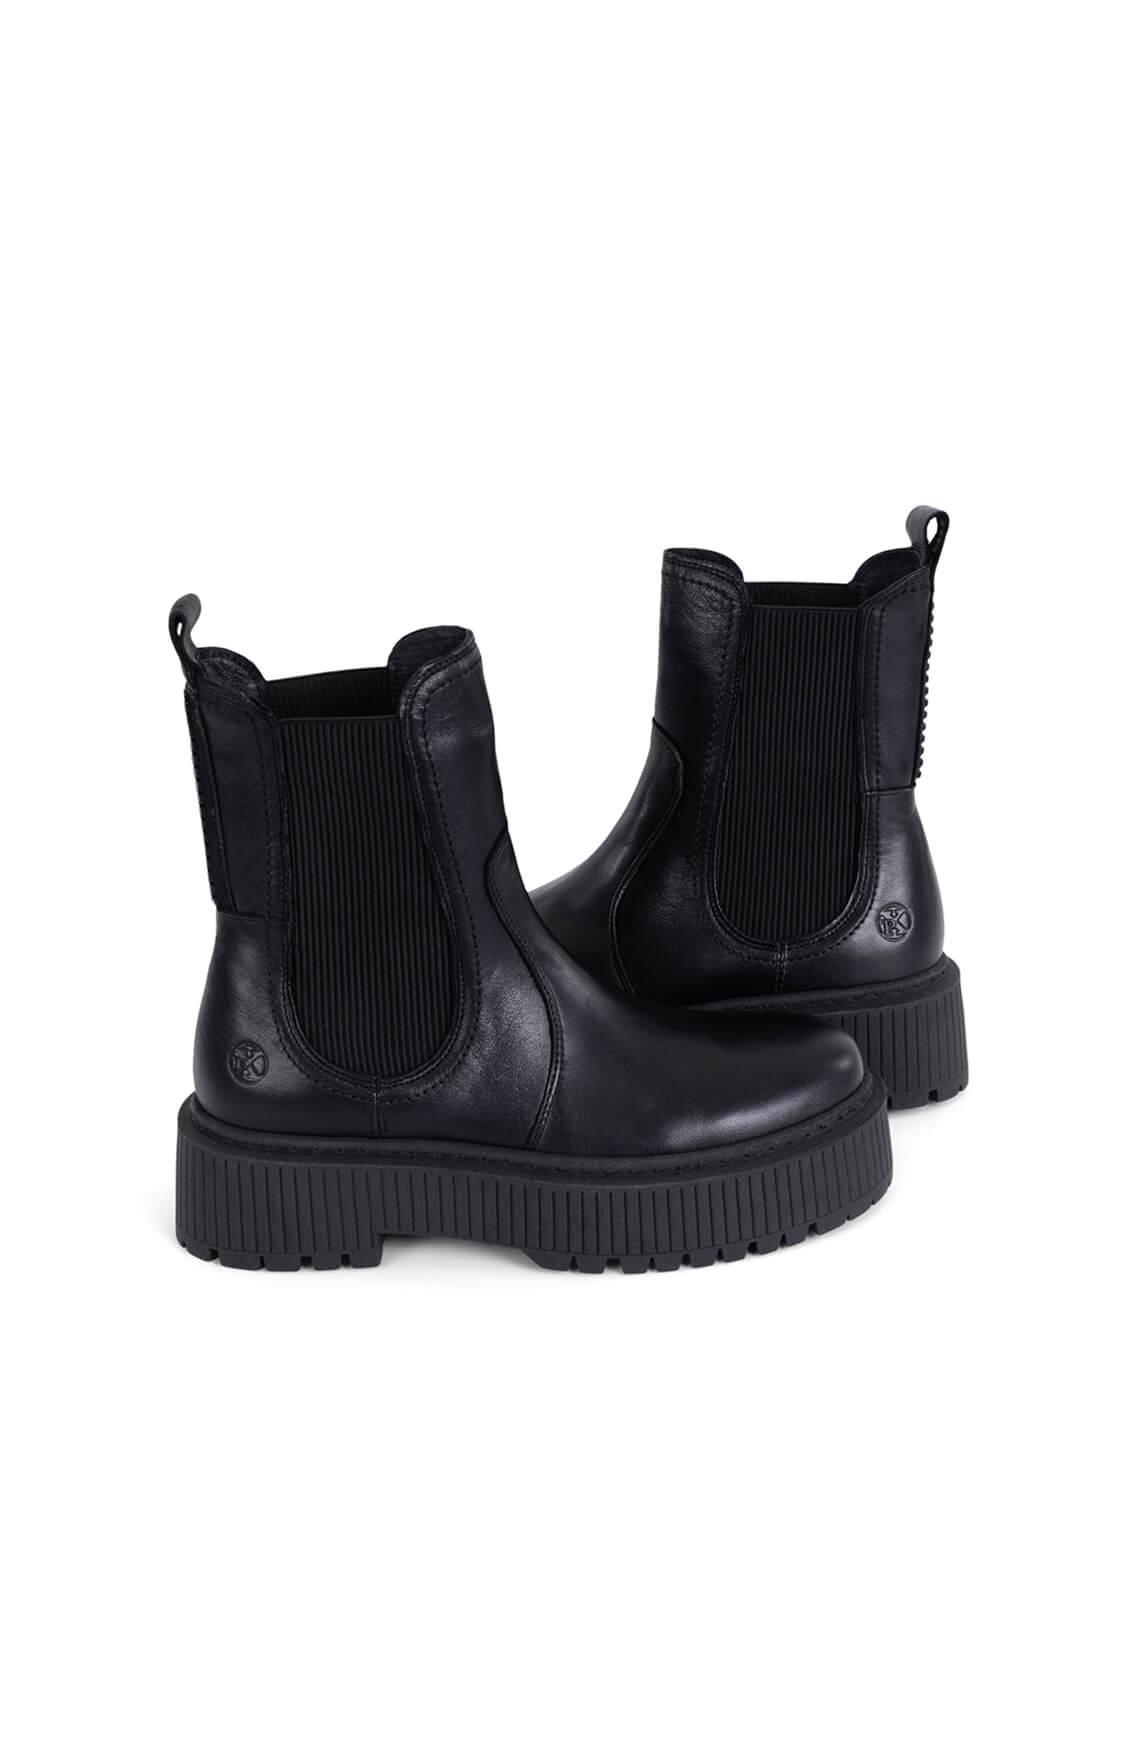 Postxchange Dames Kaia boot Zwart